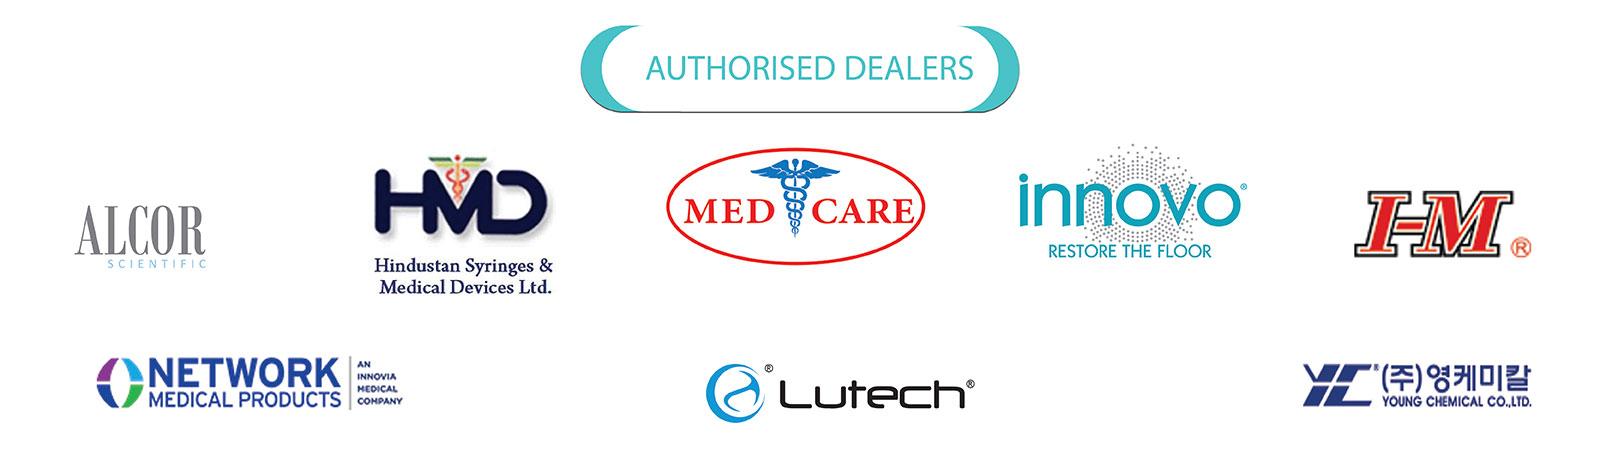 Medmen Medical Equipment Company